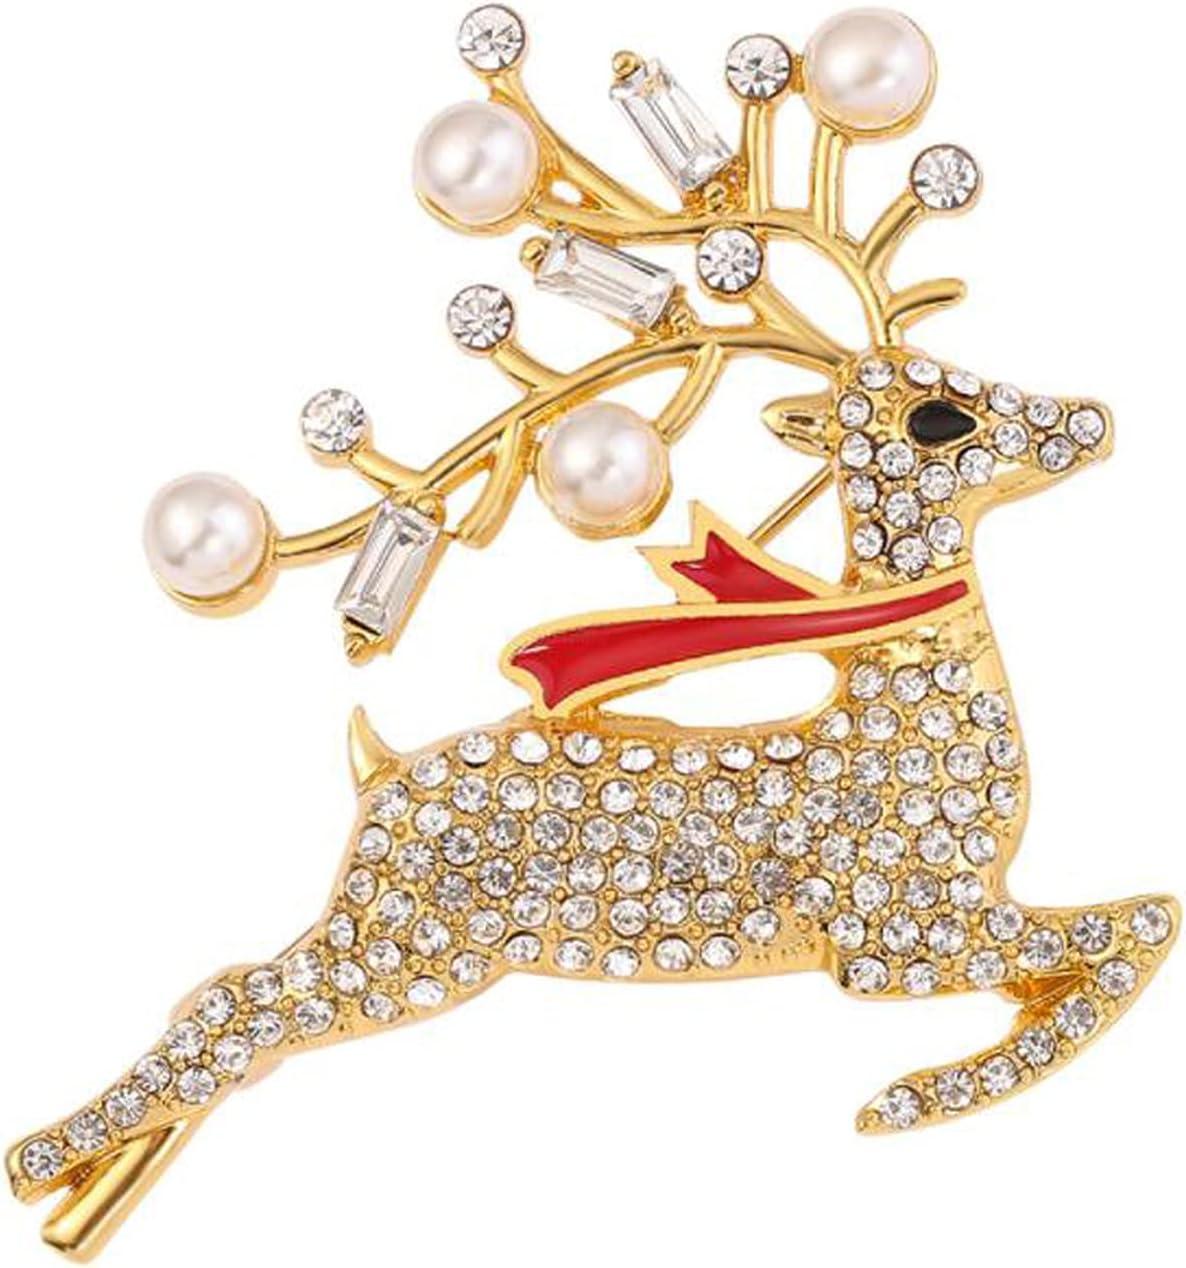 Cngstar Rhinestone Christmas Elk Brooch Pin Xmas Party Favor Gift for Women Girls,Gold